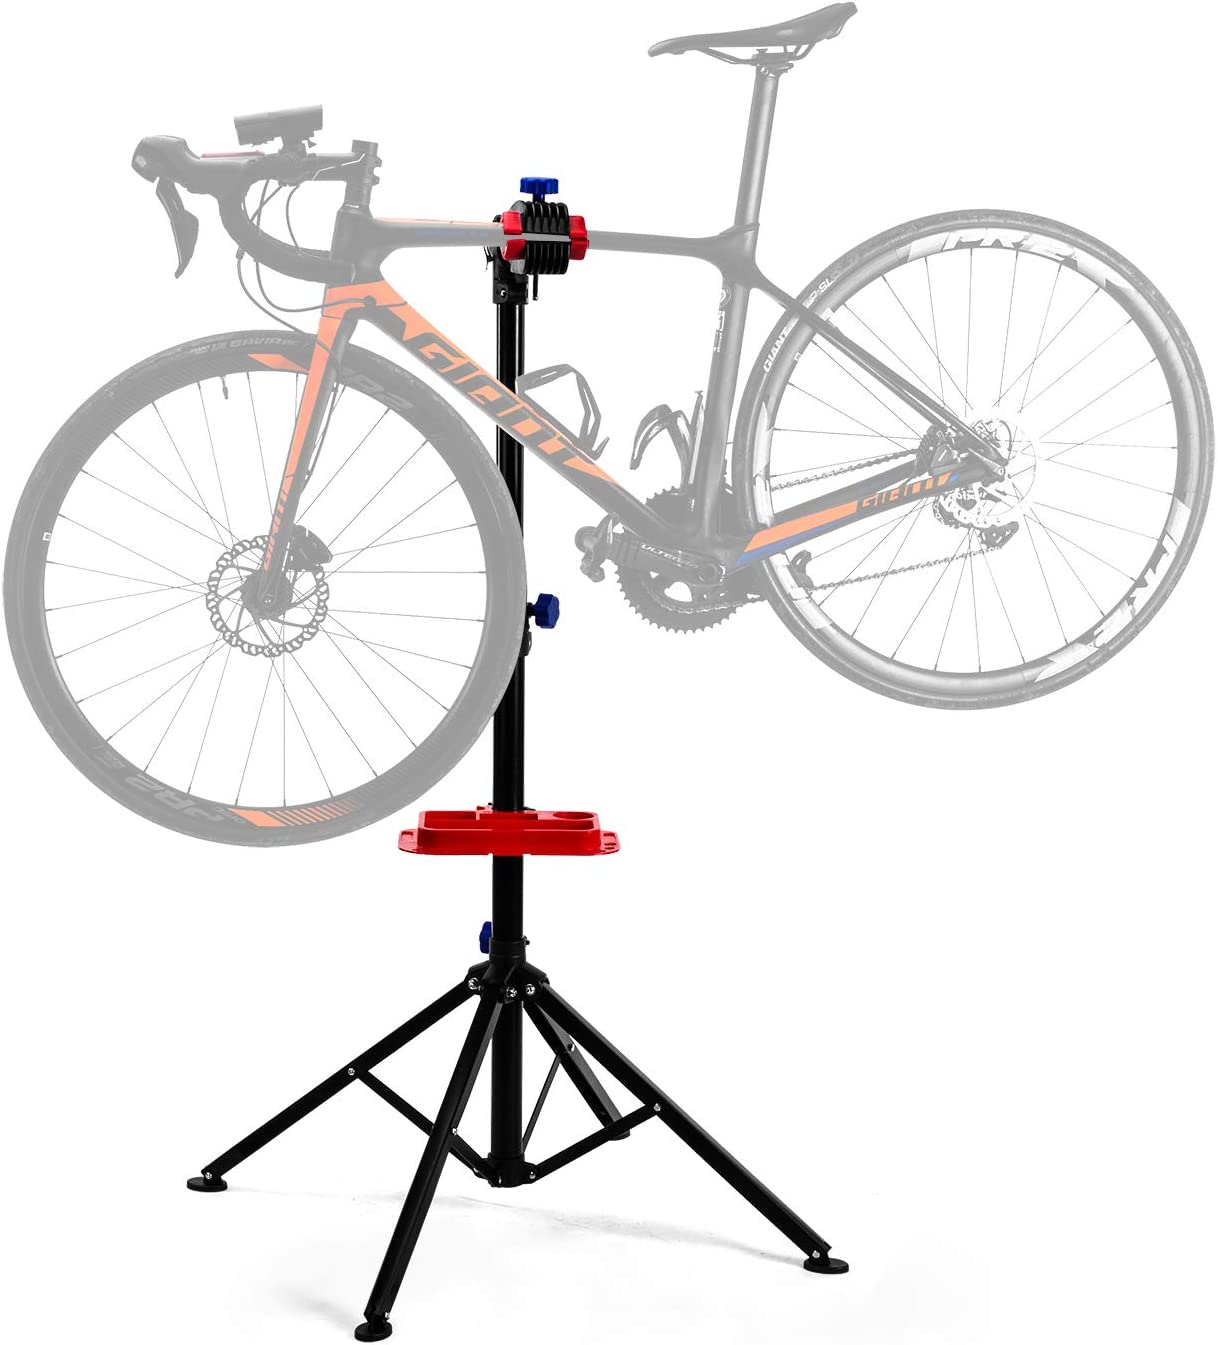 ROCKBROS Caballete para Bicicleta Soporte de Reparación Plegable ...